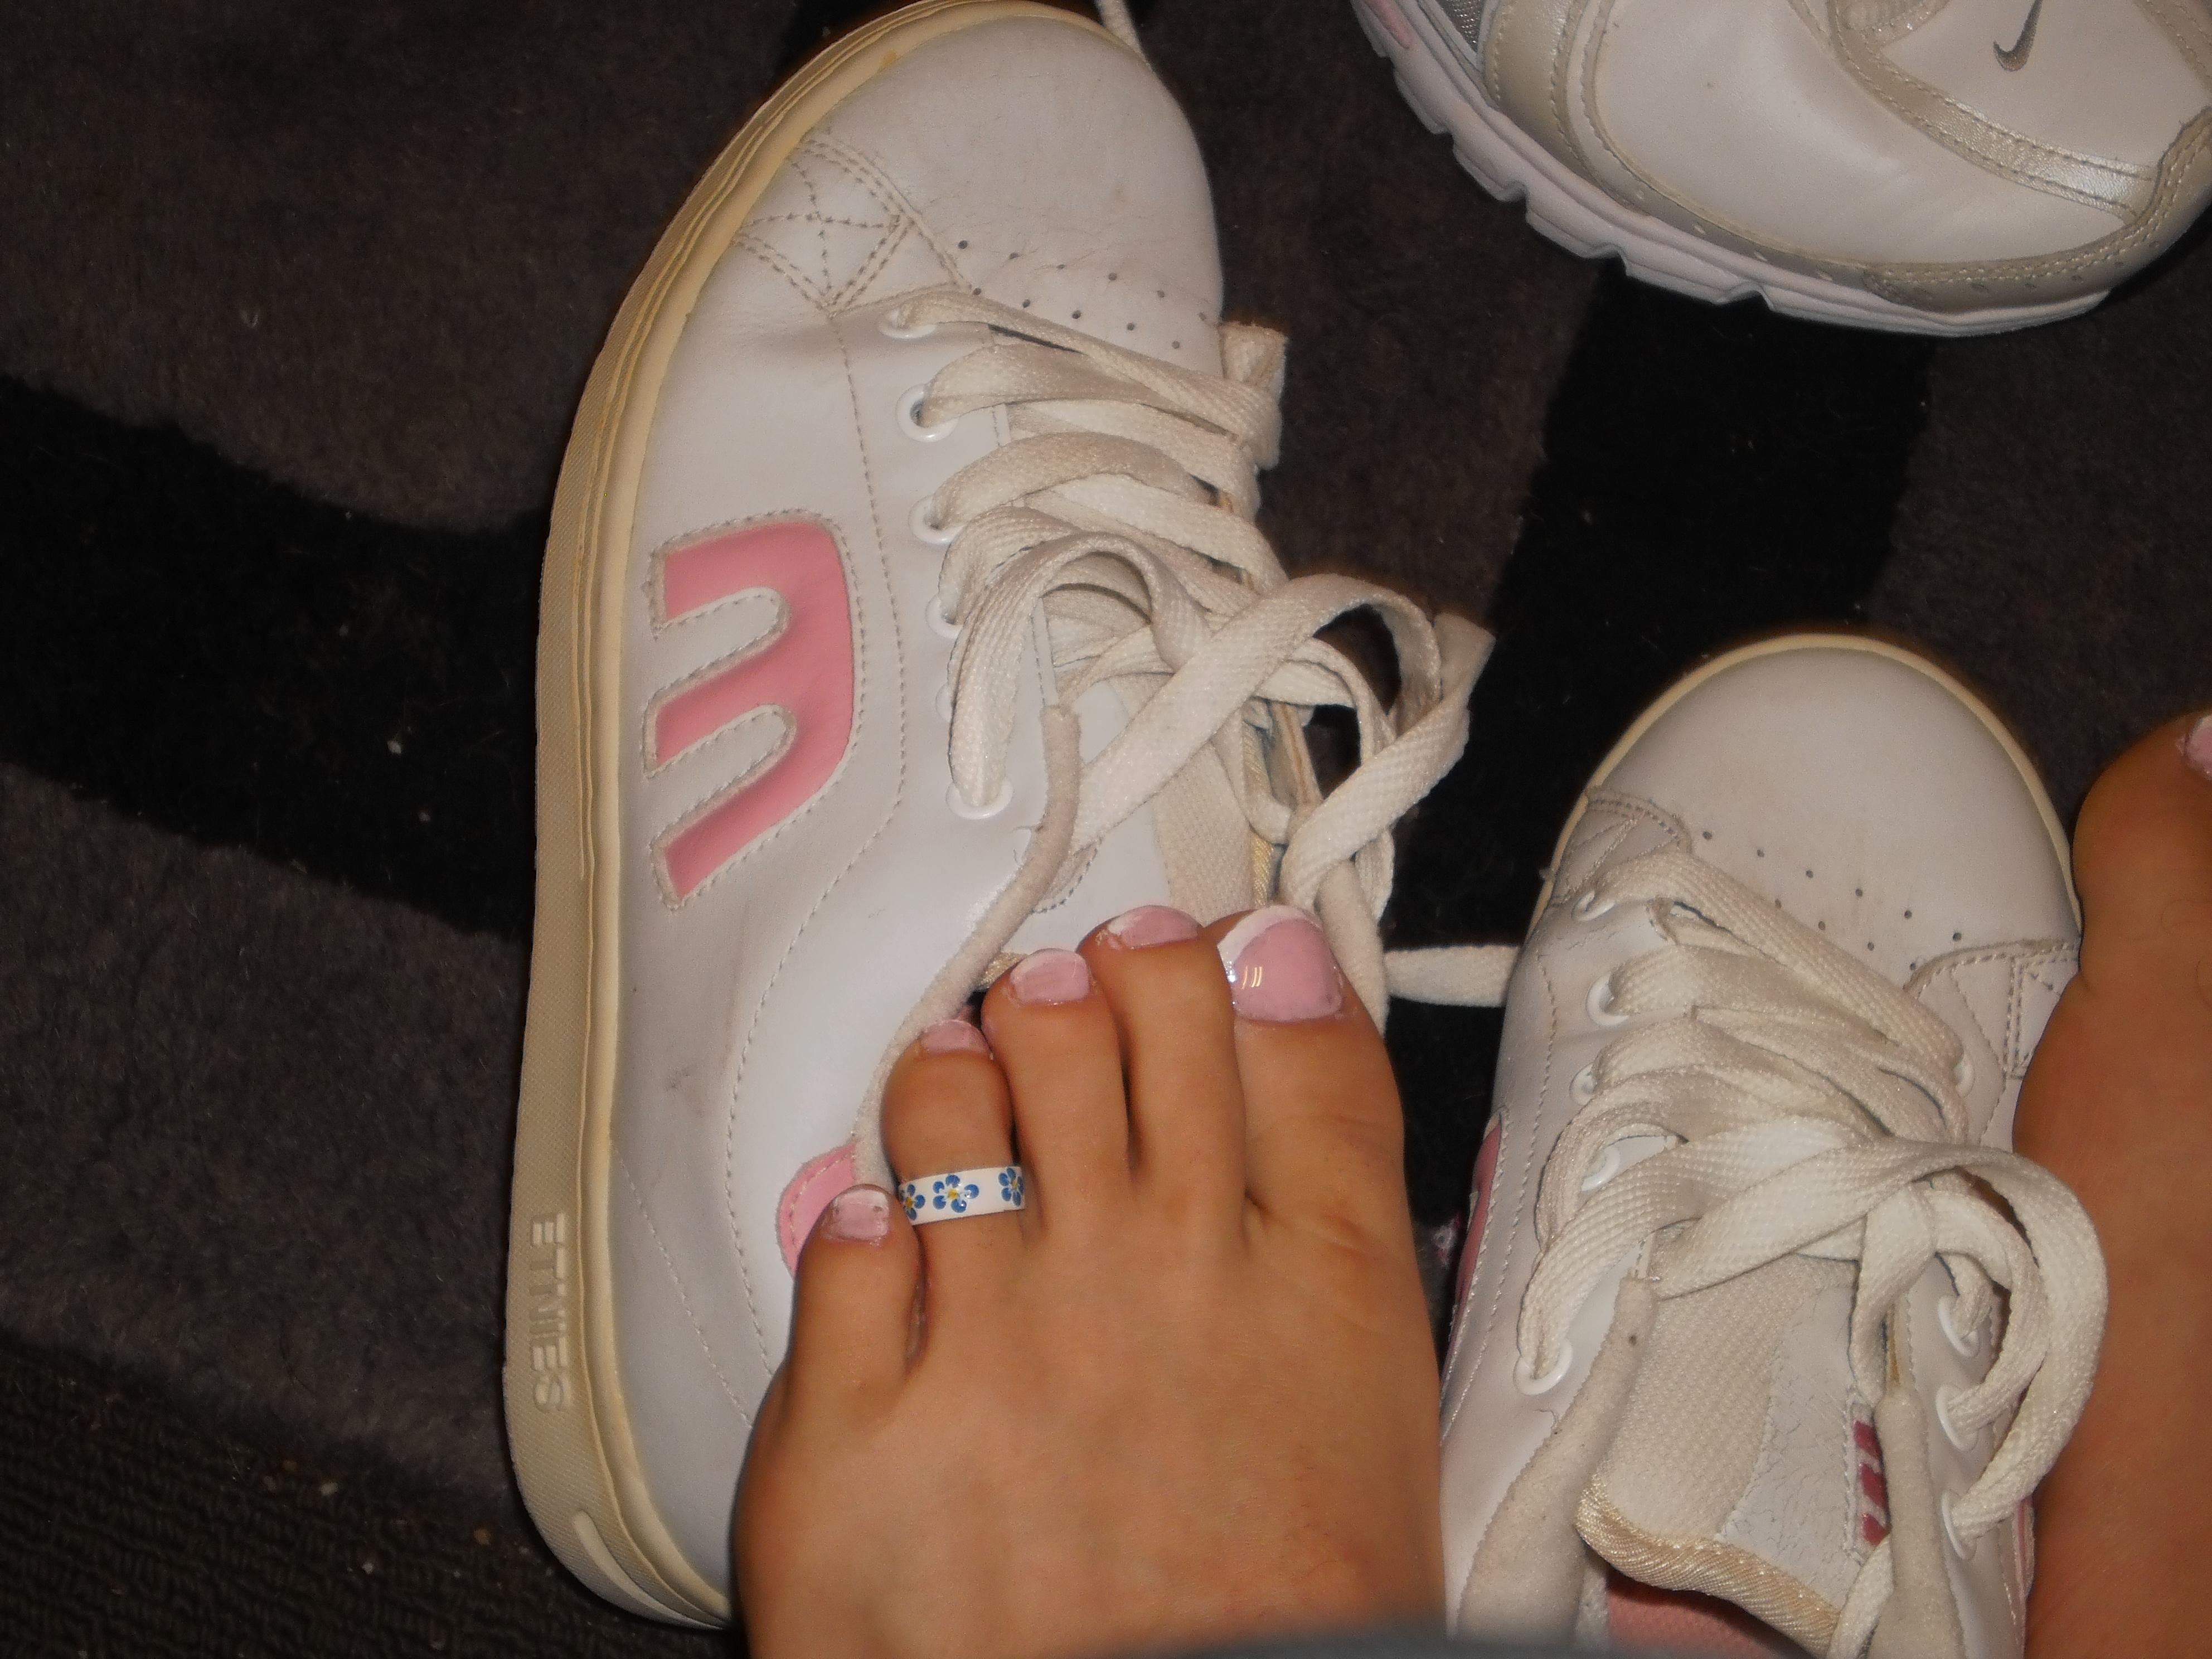 Sfondi : Nike, cibo, donne, calzini, jeans, Adidas, scarpe